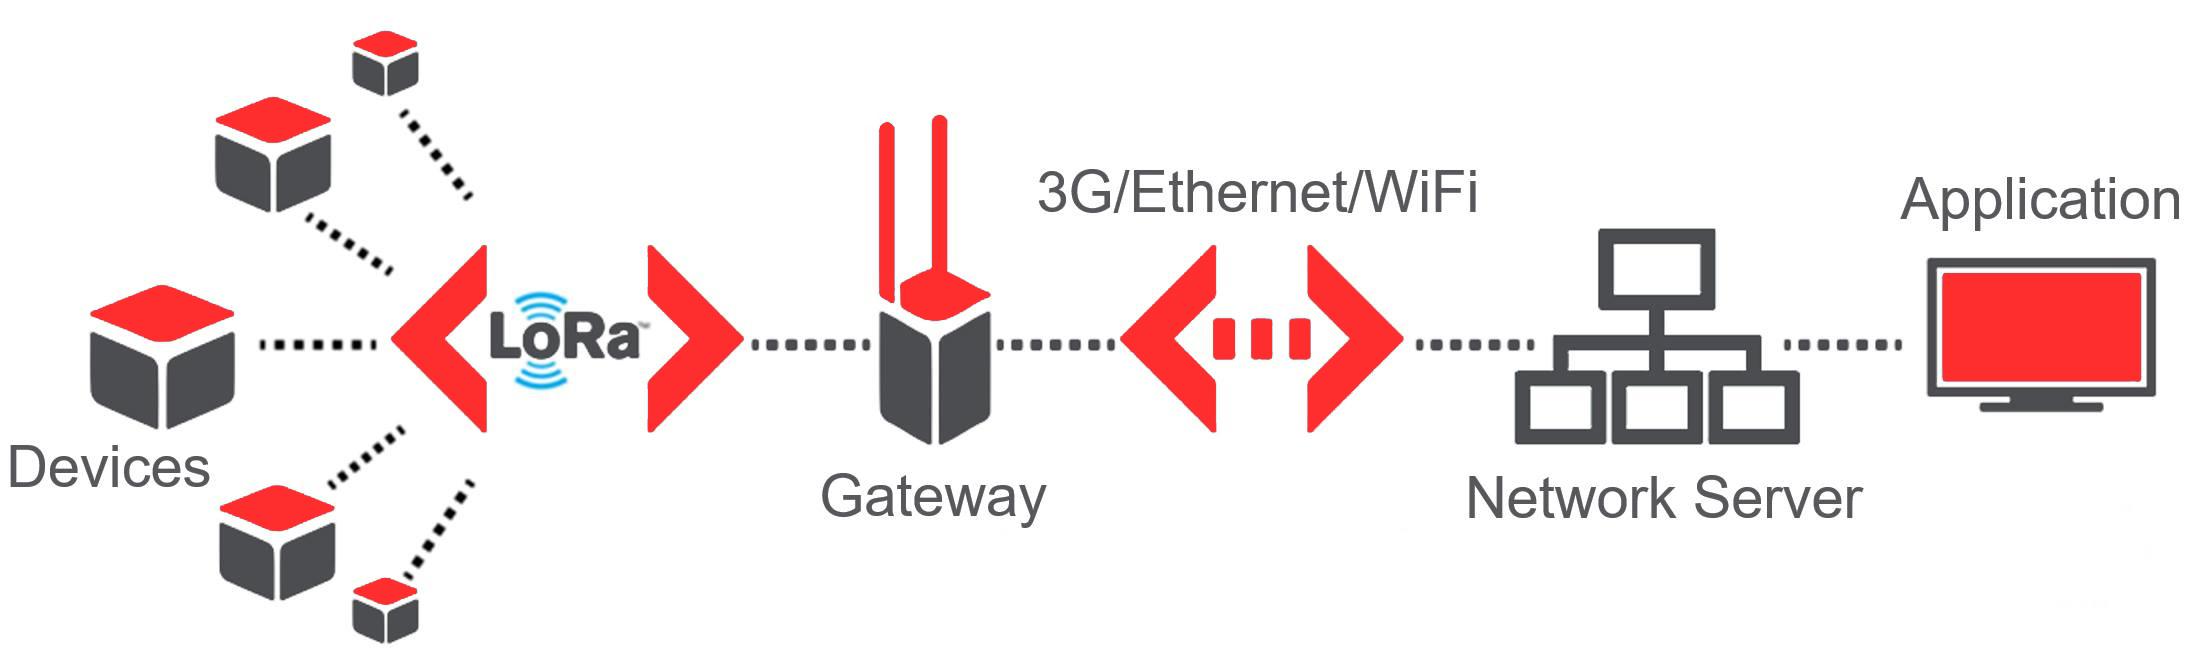 lorawan-network-architecture